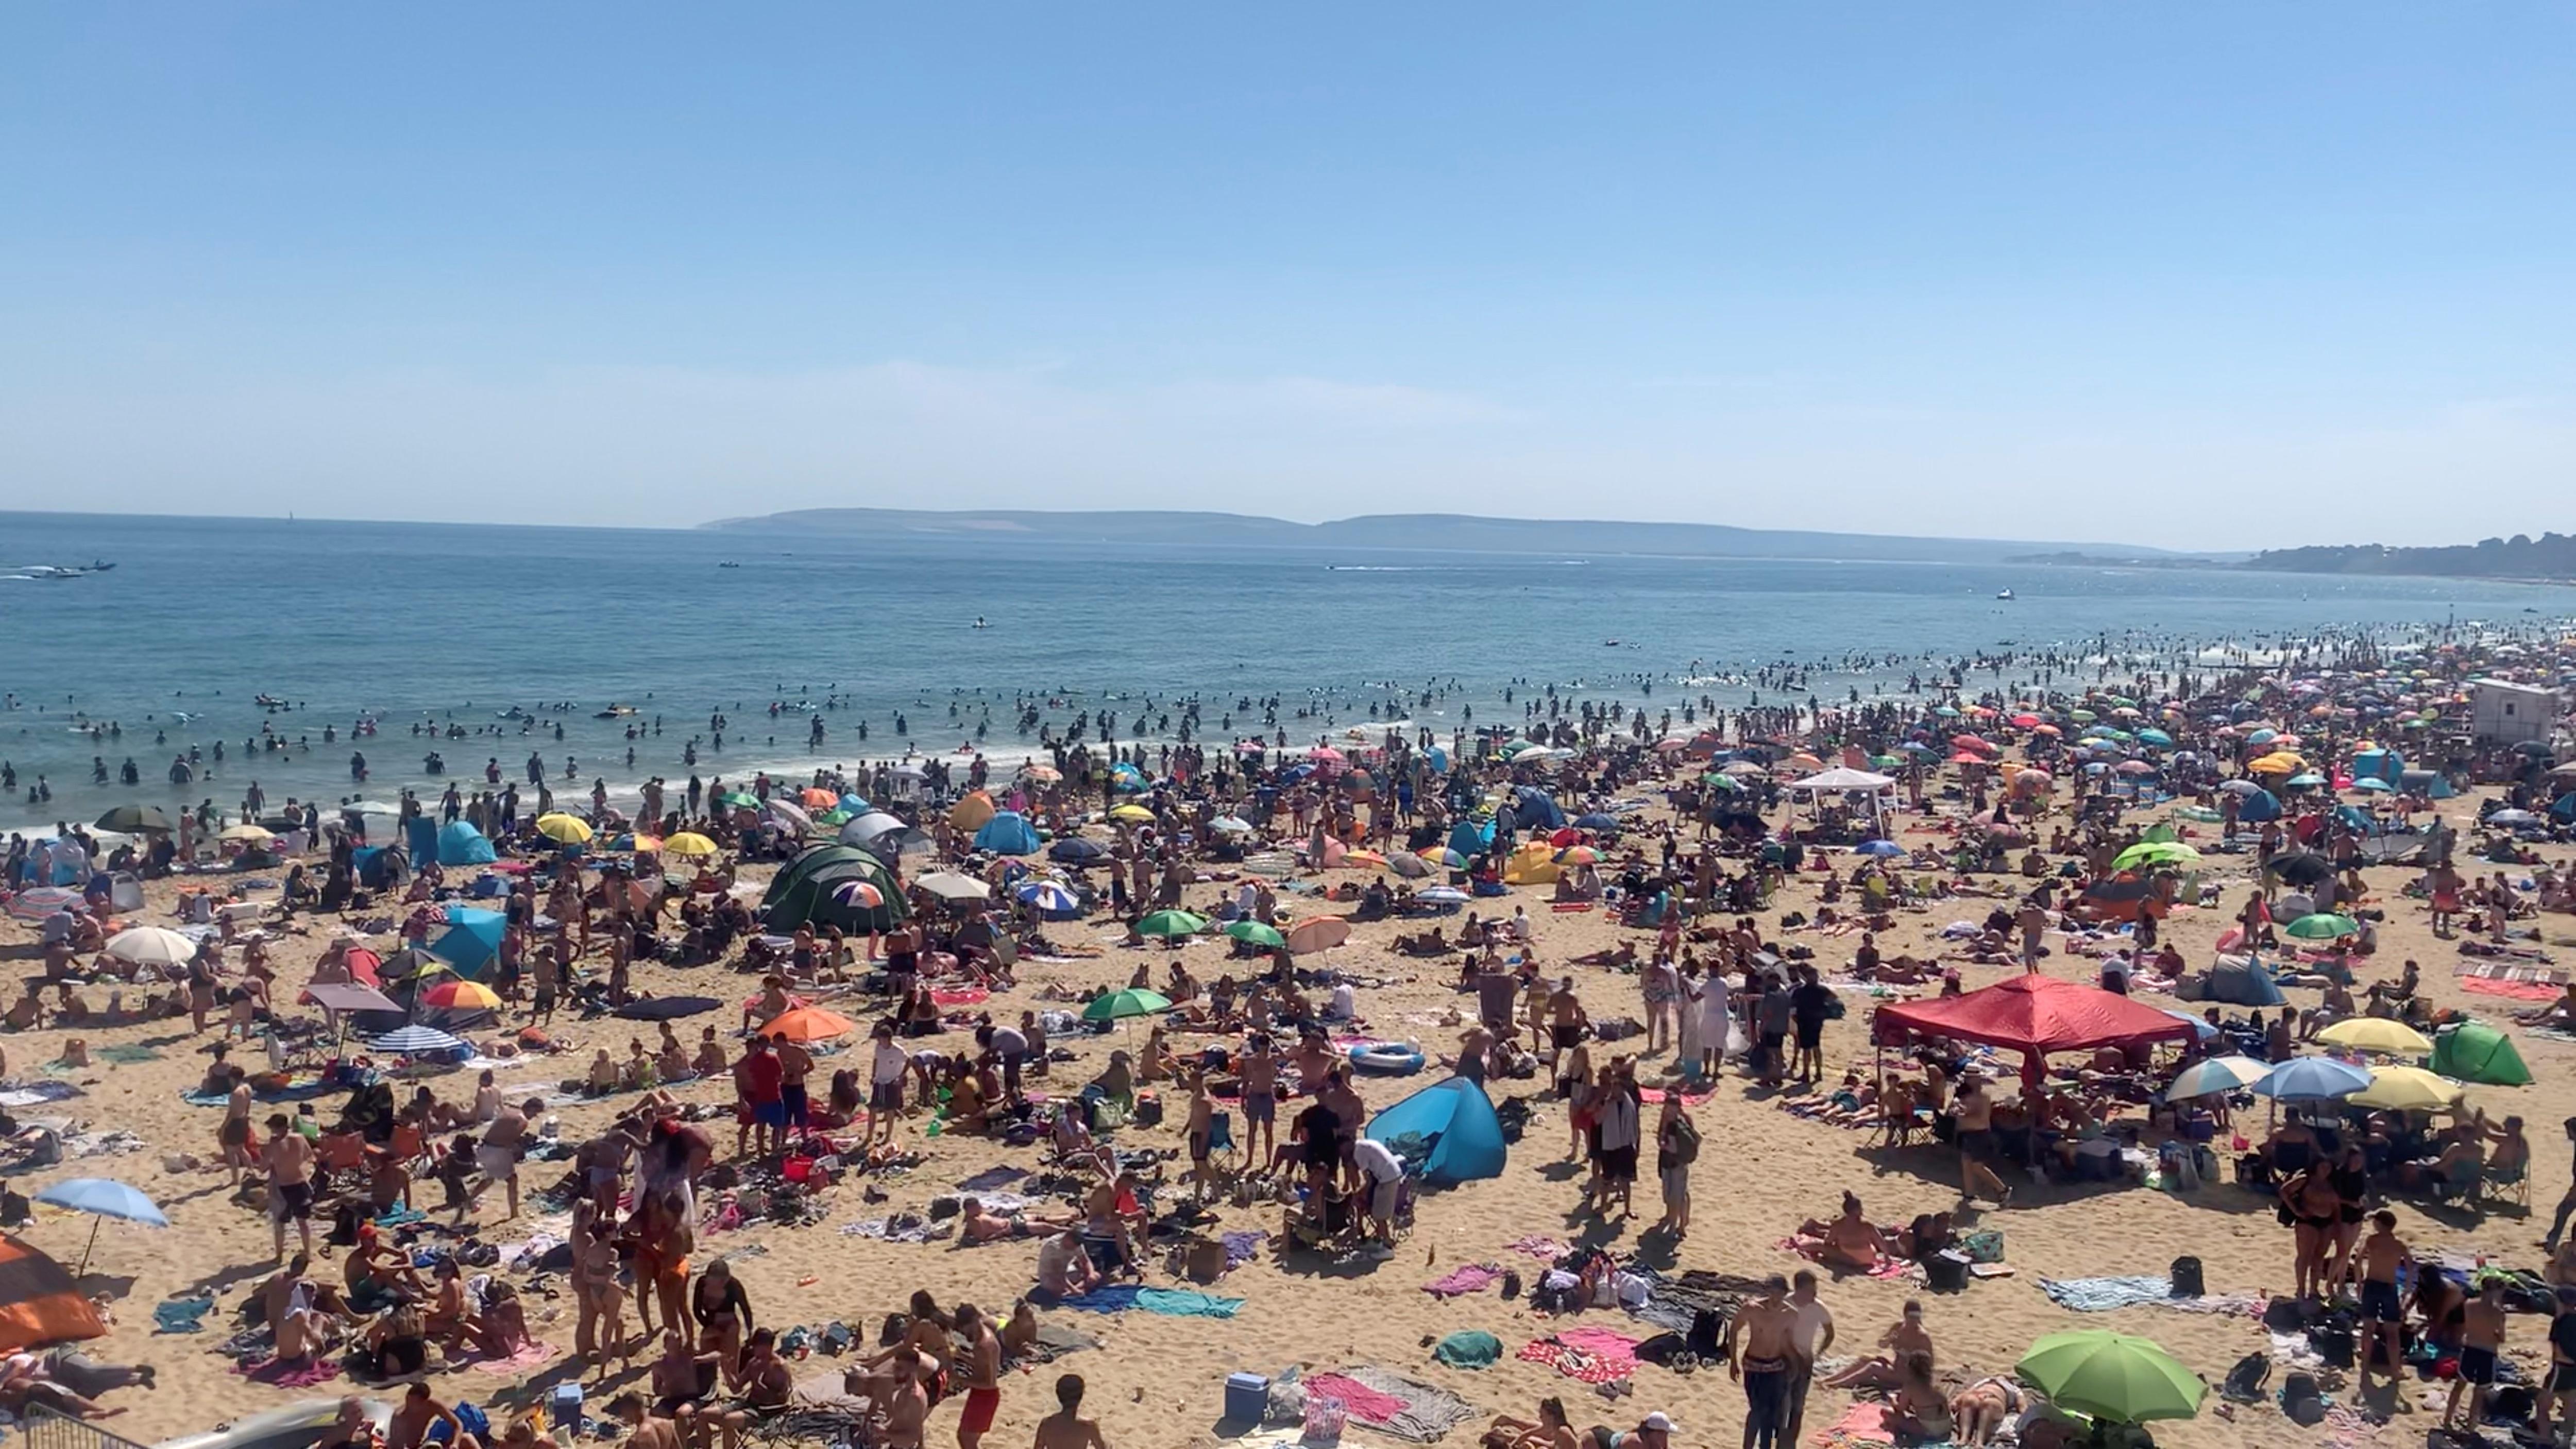 <p>People flock to UK beaches, doctors raise concern</p>